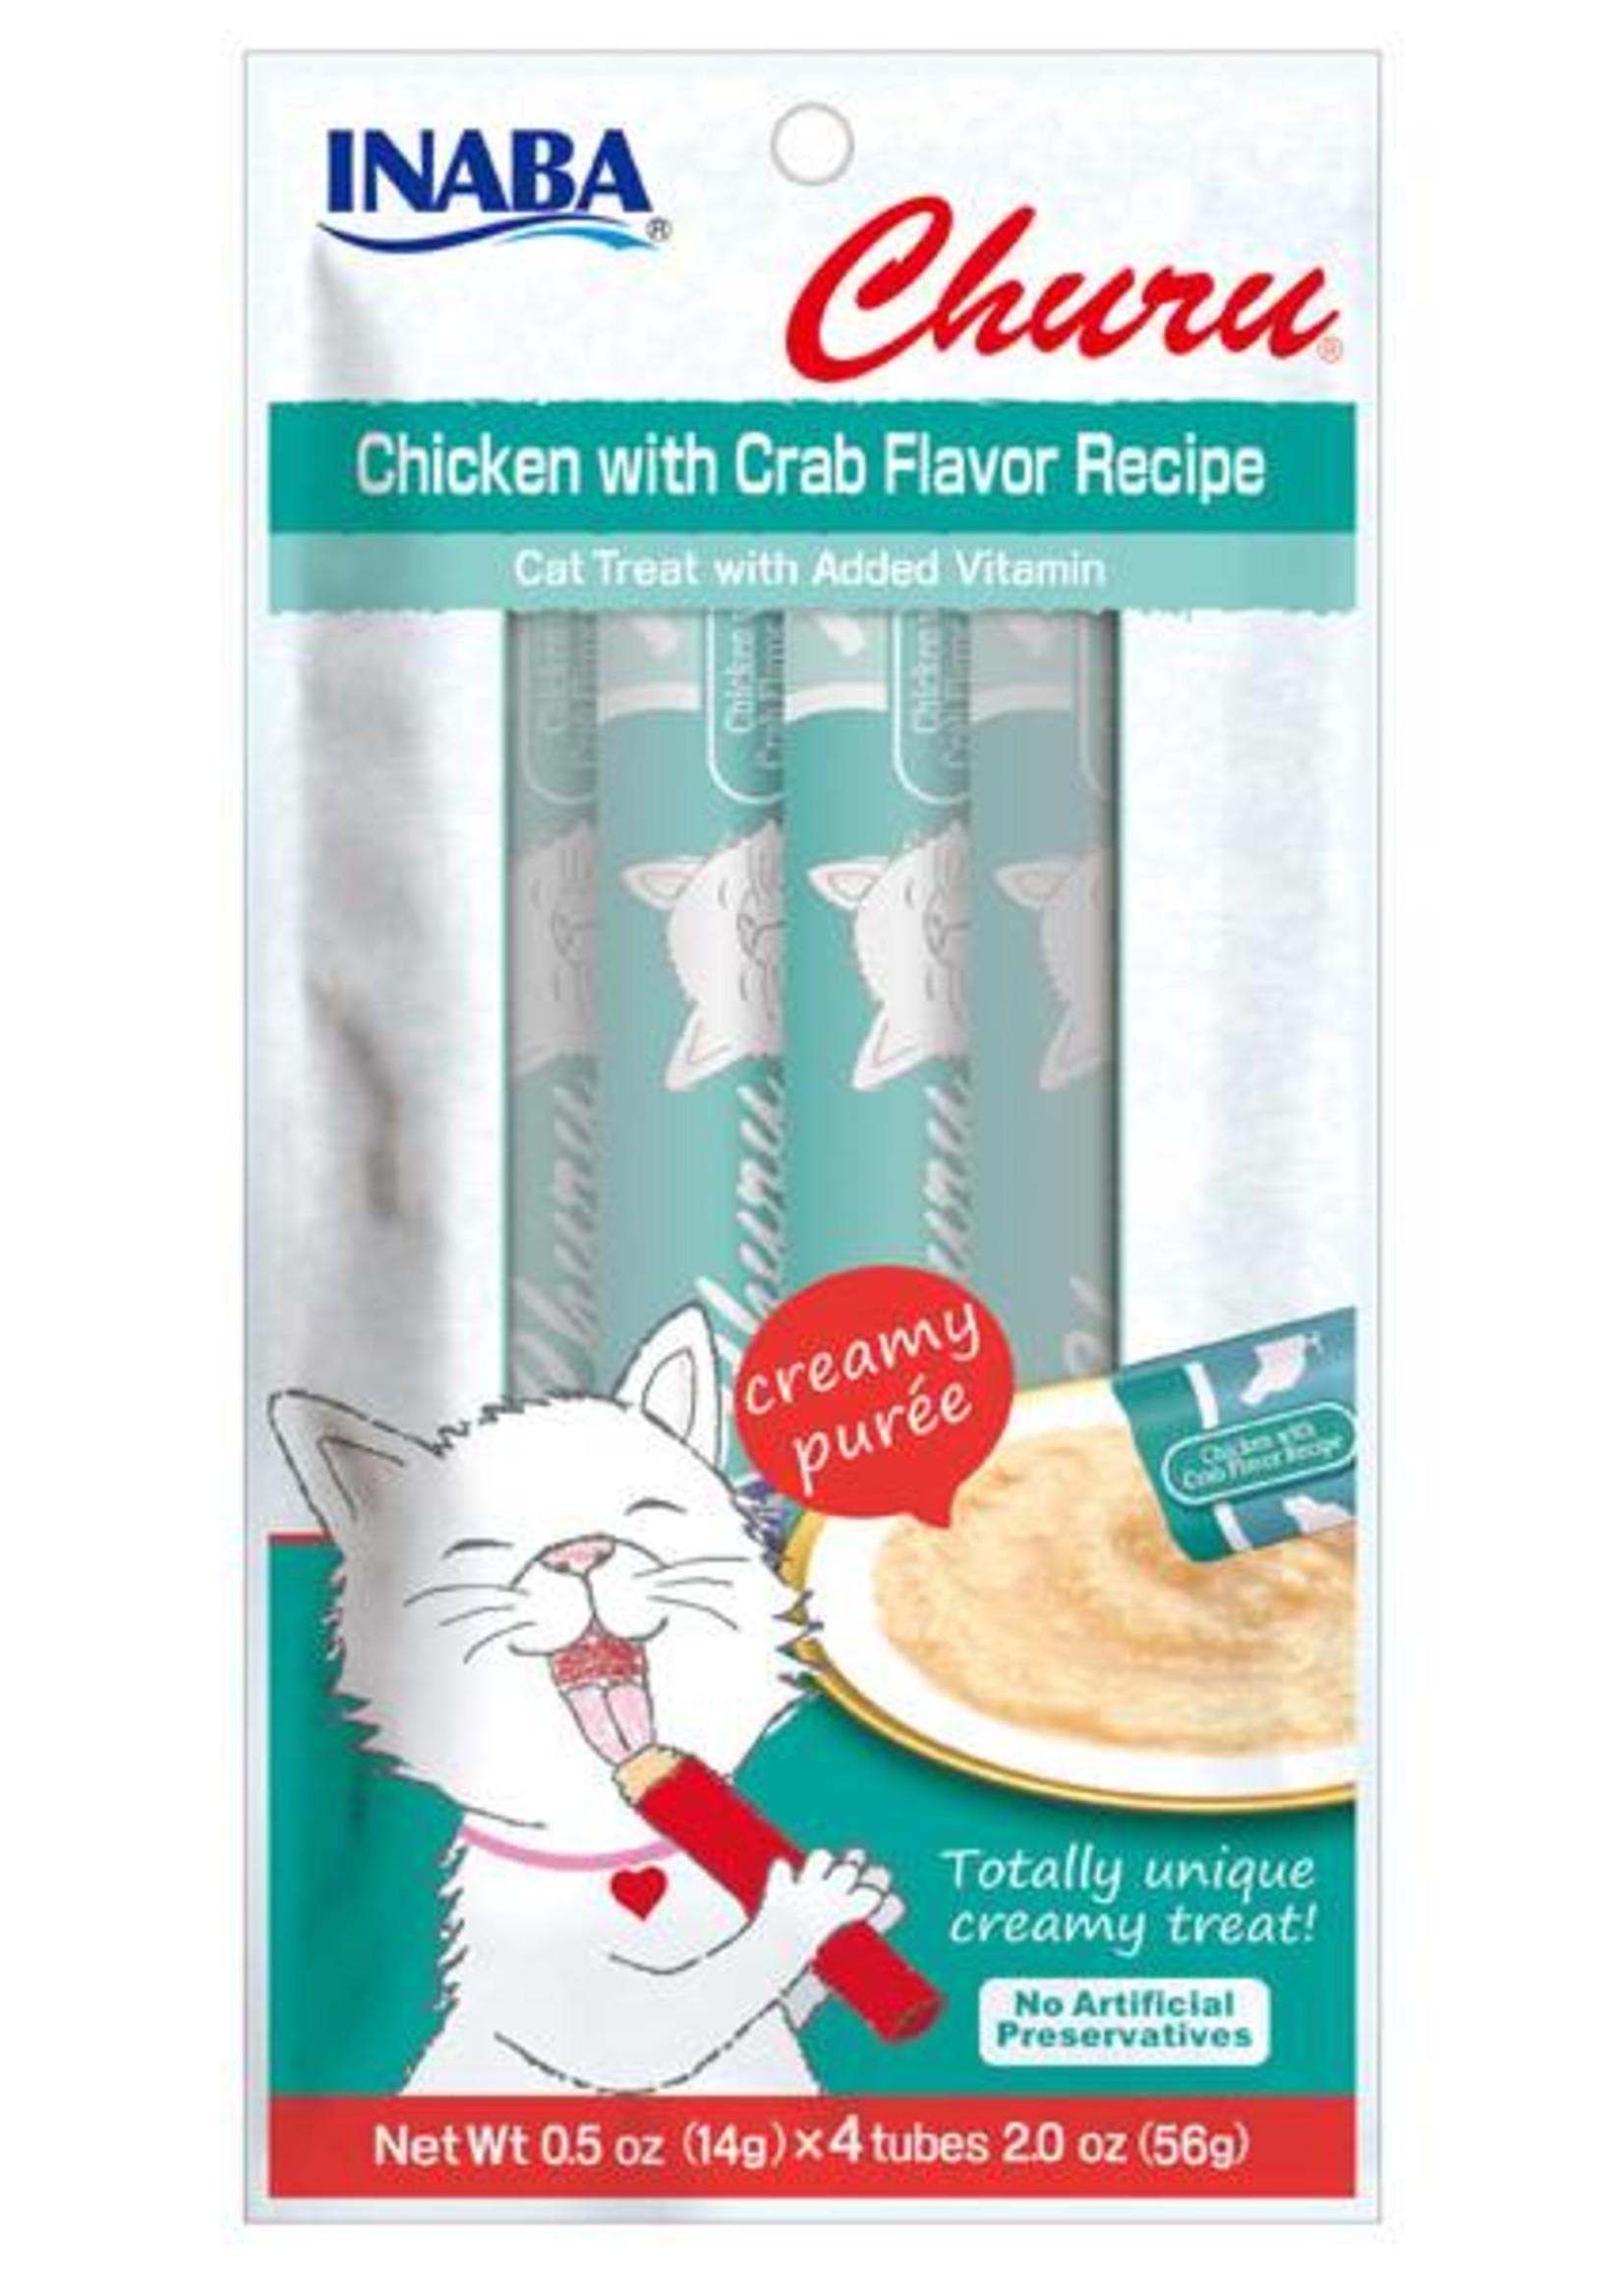 INA Churu Puree Chicken with Crab Flavour 4pk